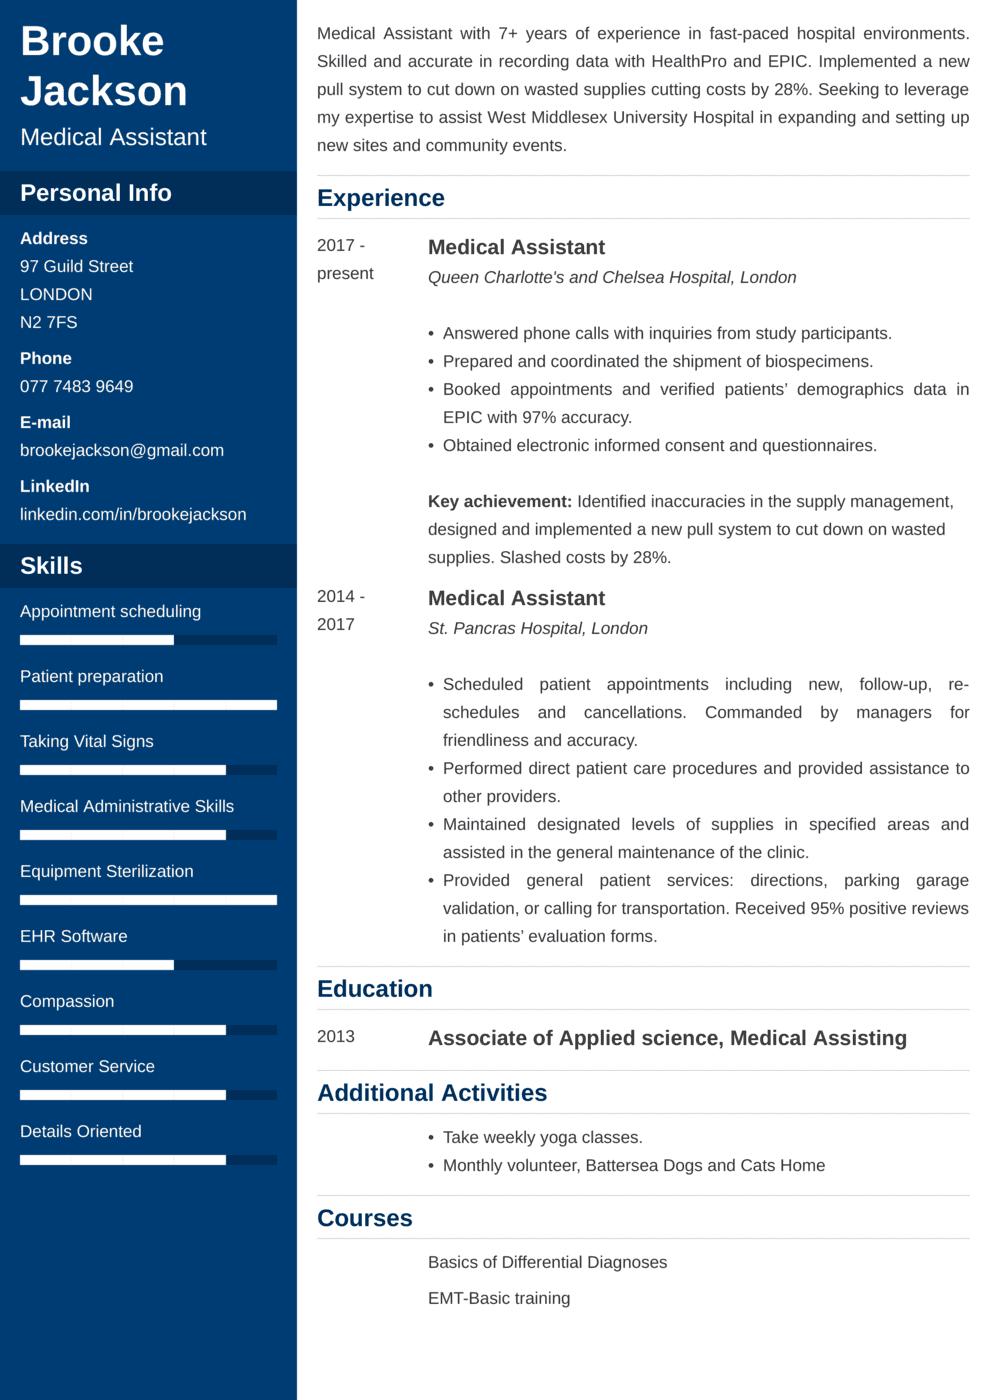 Medical Assistant CV Example